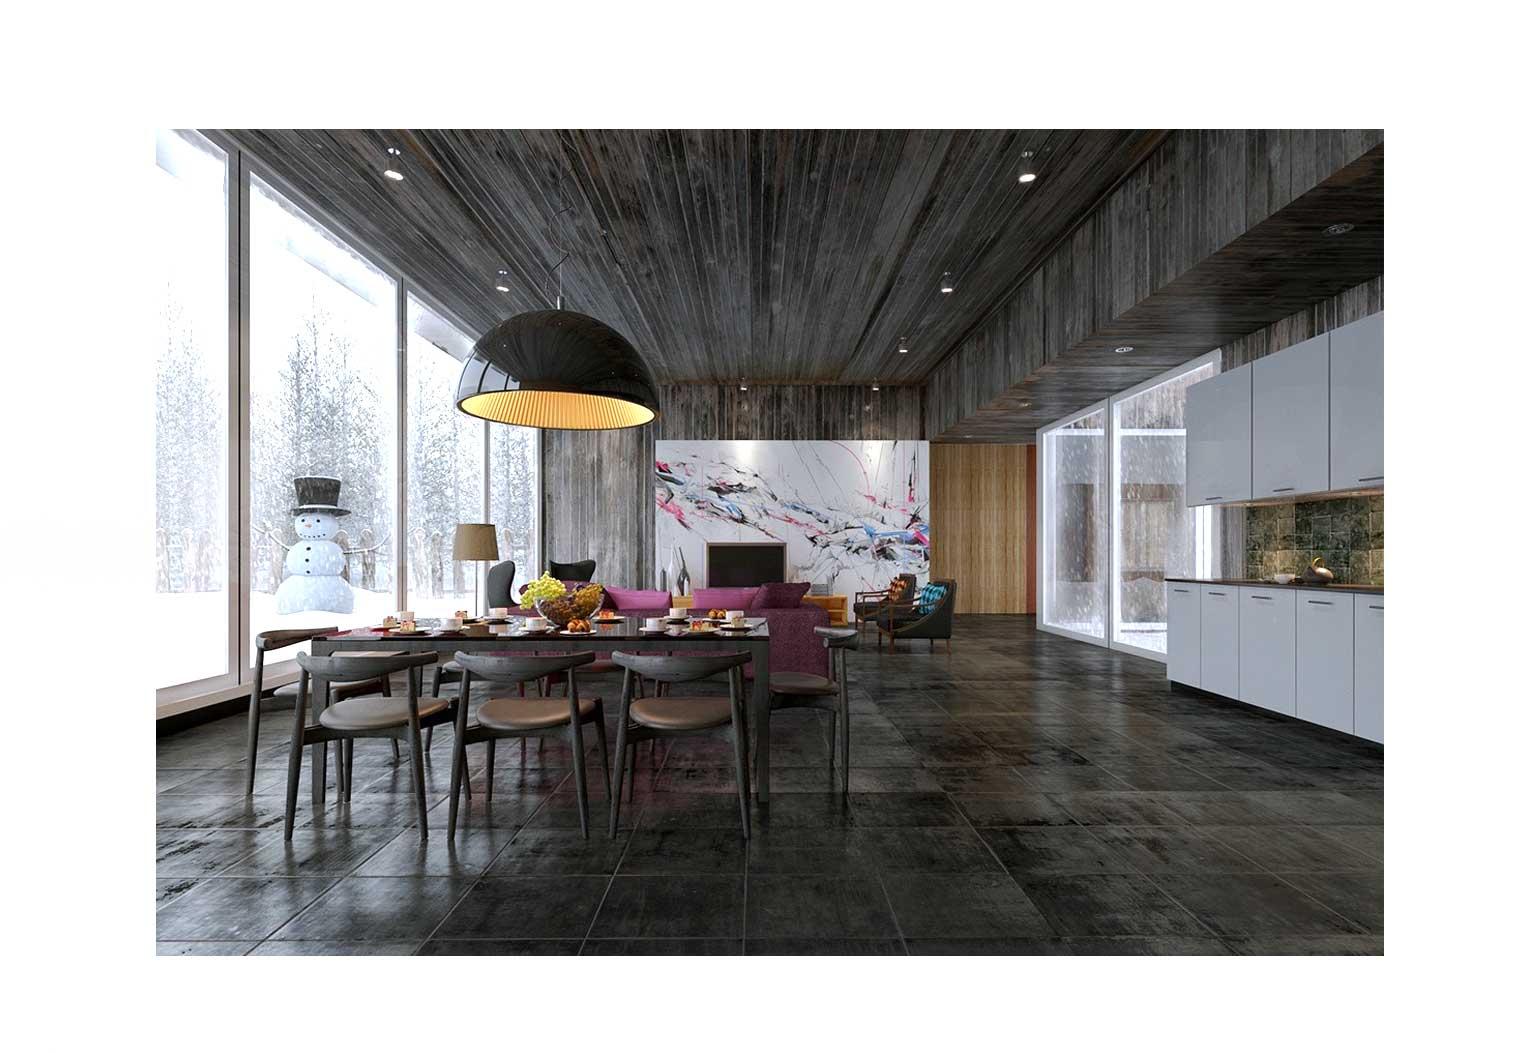 Design An Art centric Room049g - چگونه یک اتاق هنری را طراحی کنیم؟